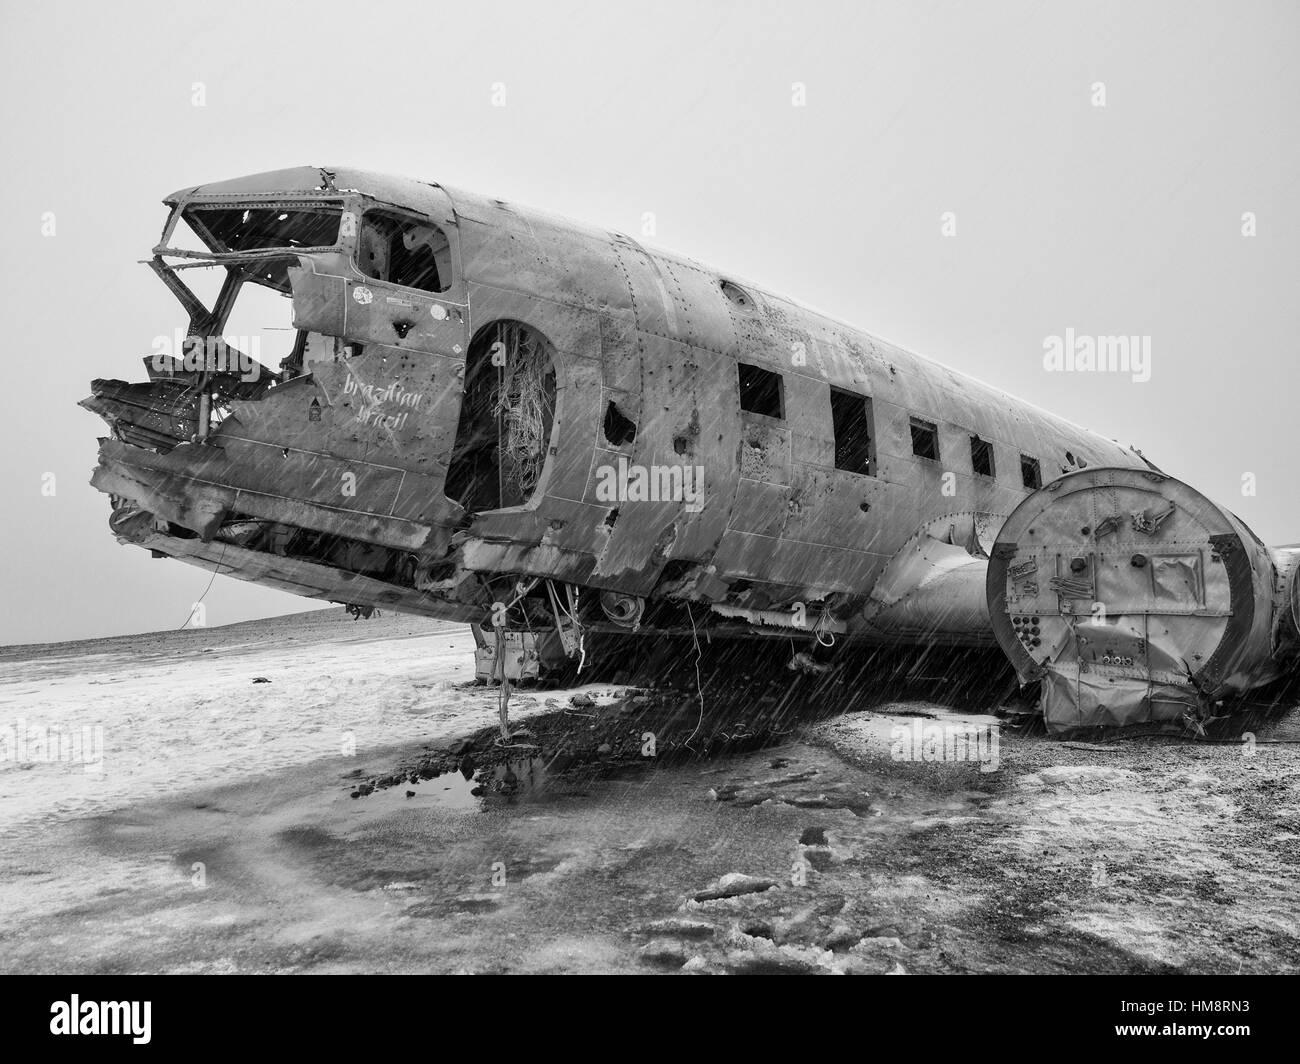 Iceland Airplane Wreckage. - Stock Image